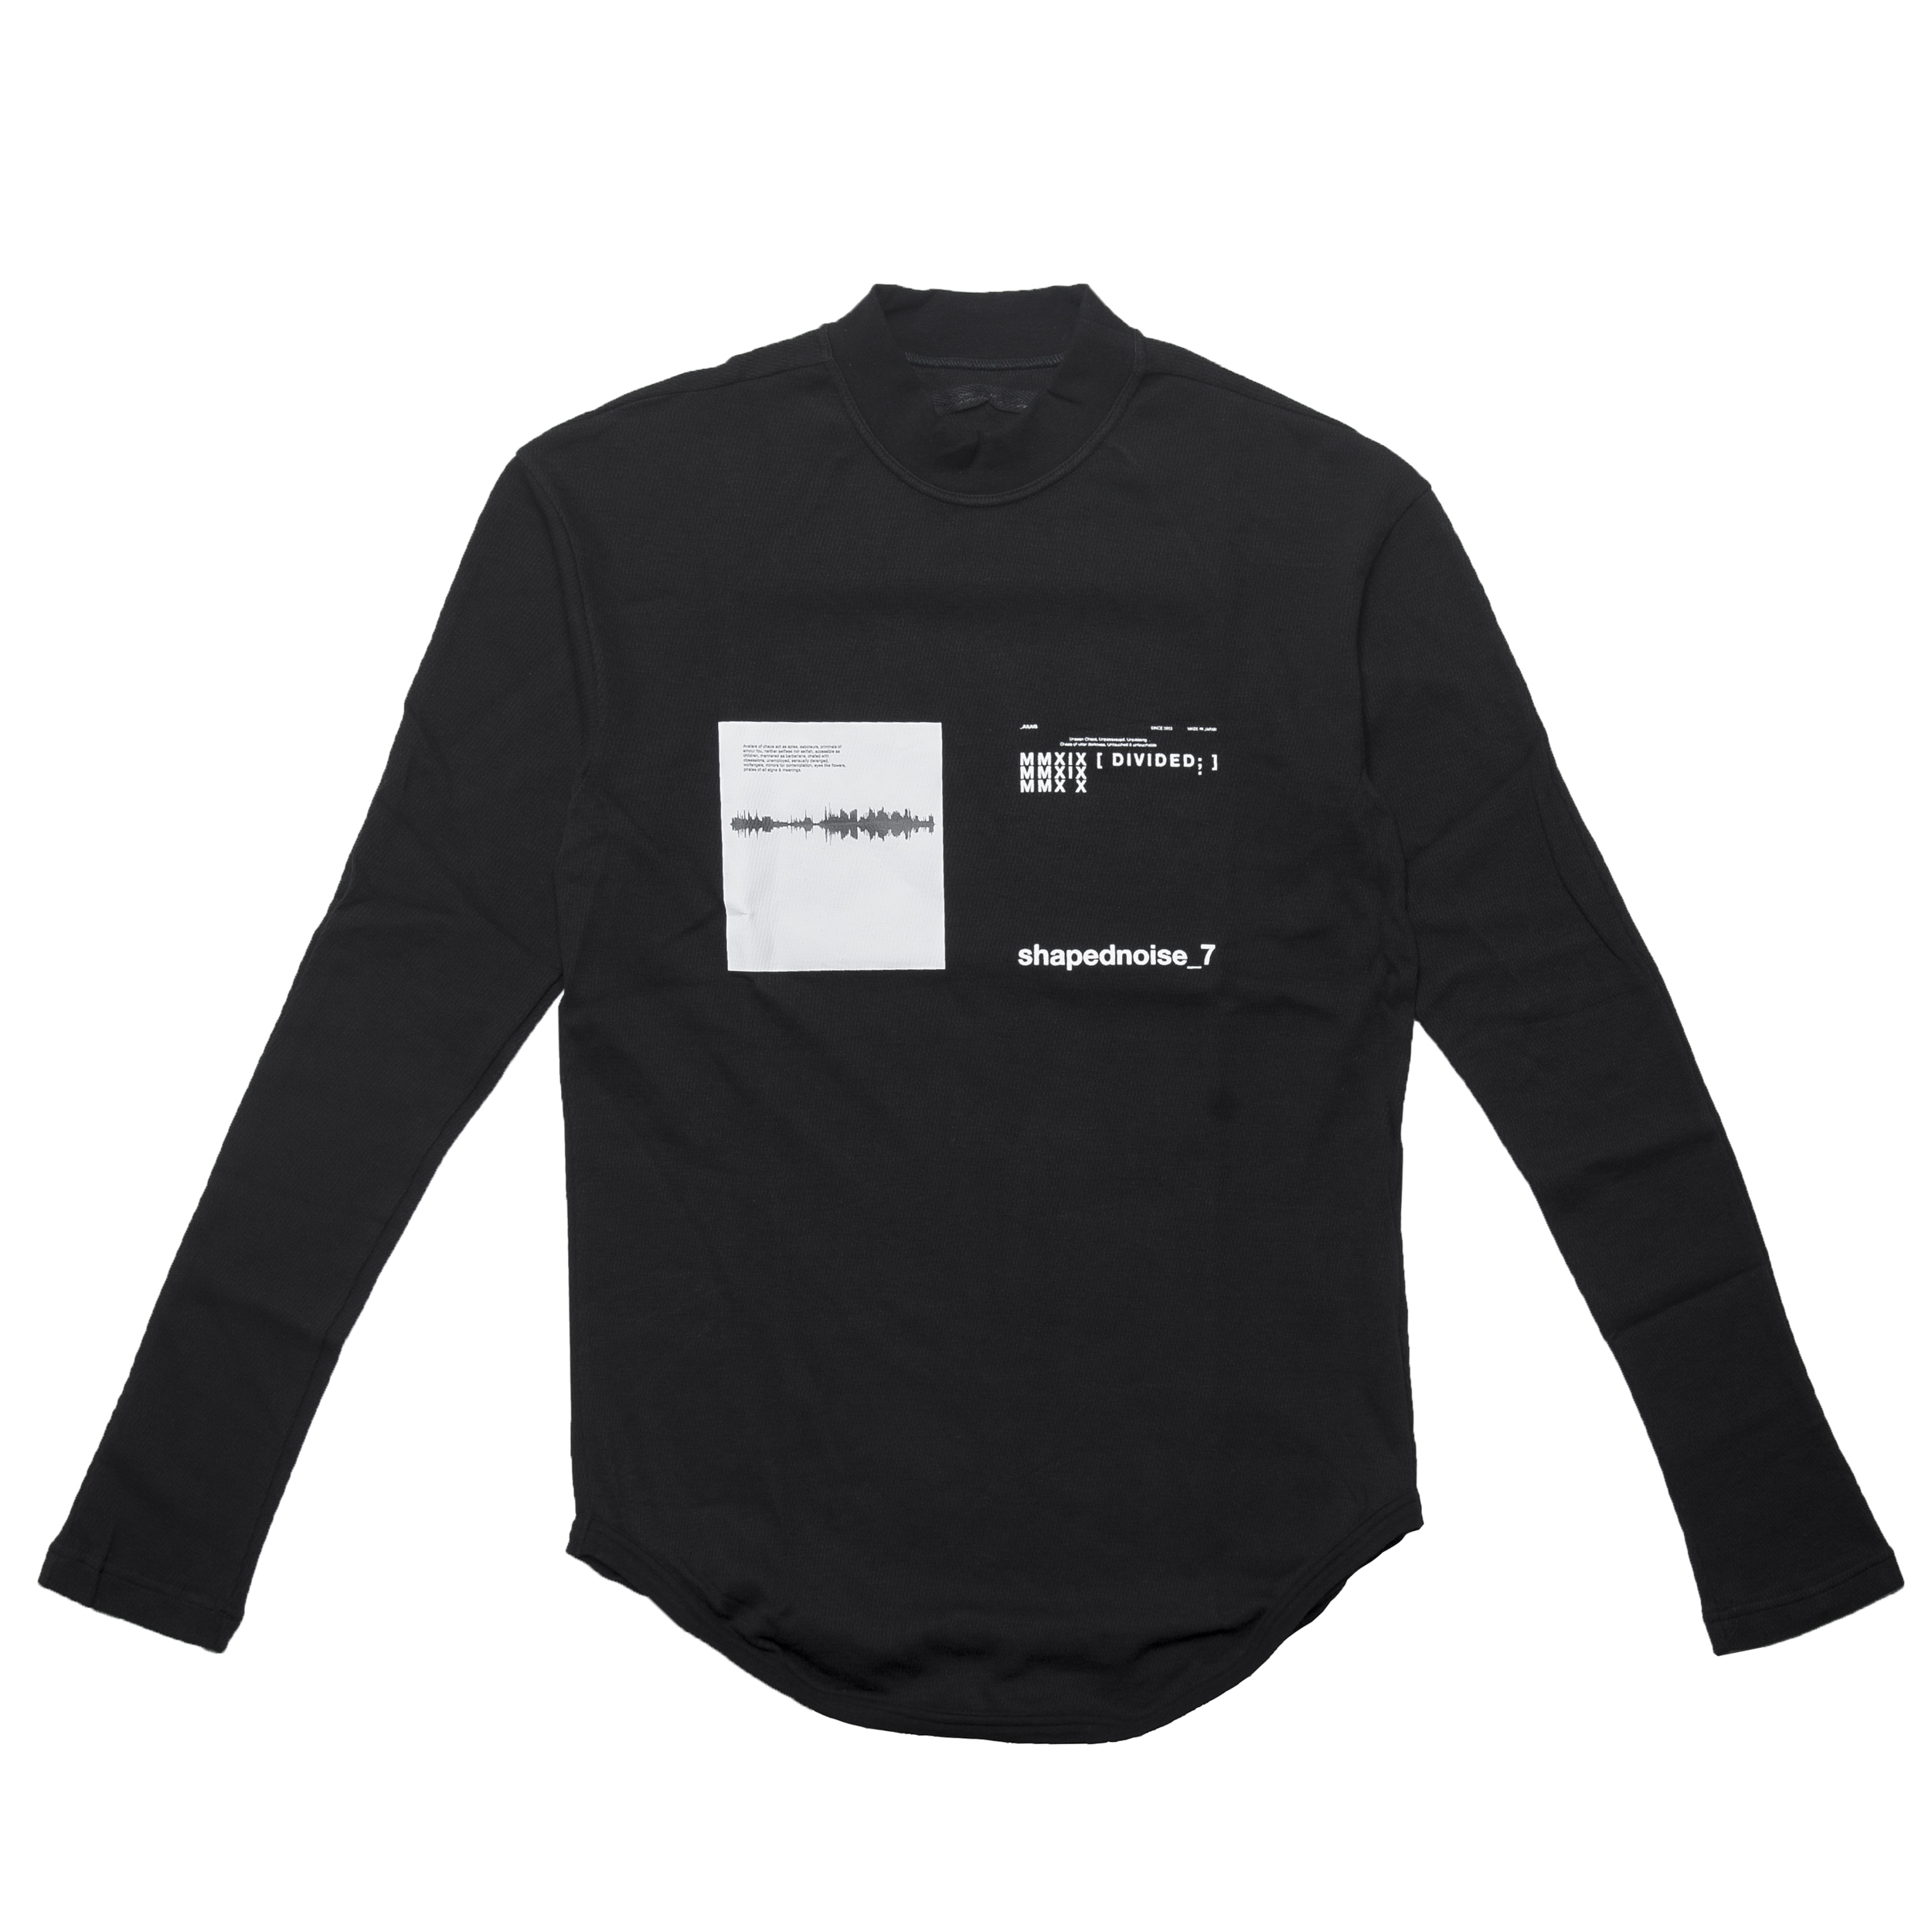 677CPM13-BLACK / Shaped Noise スキニーロングスリーブ Tシャツ